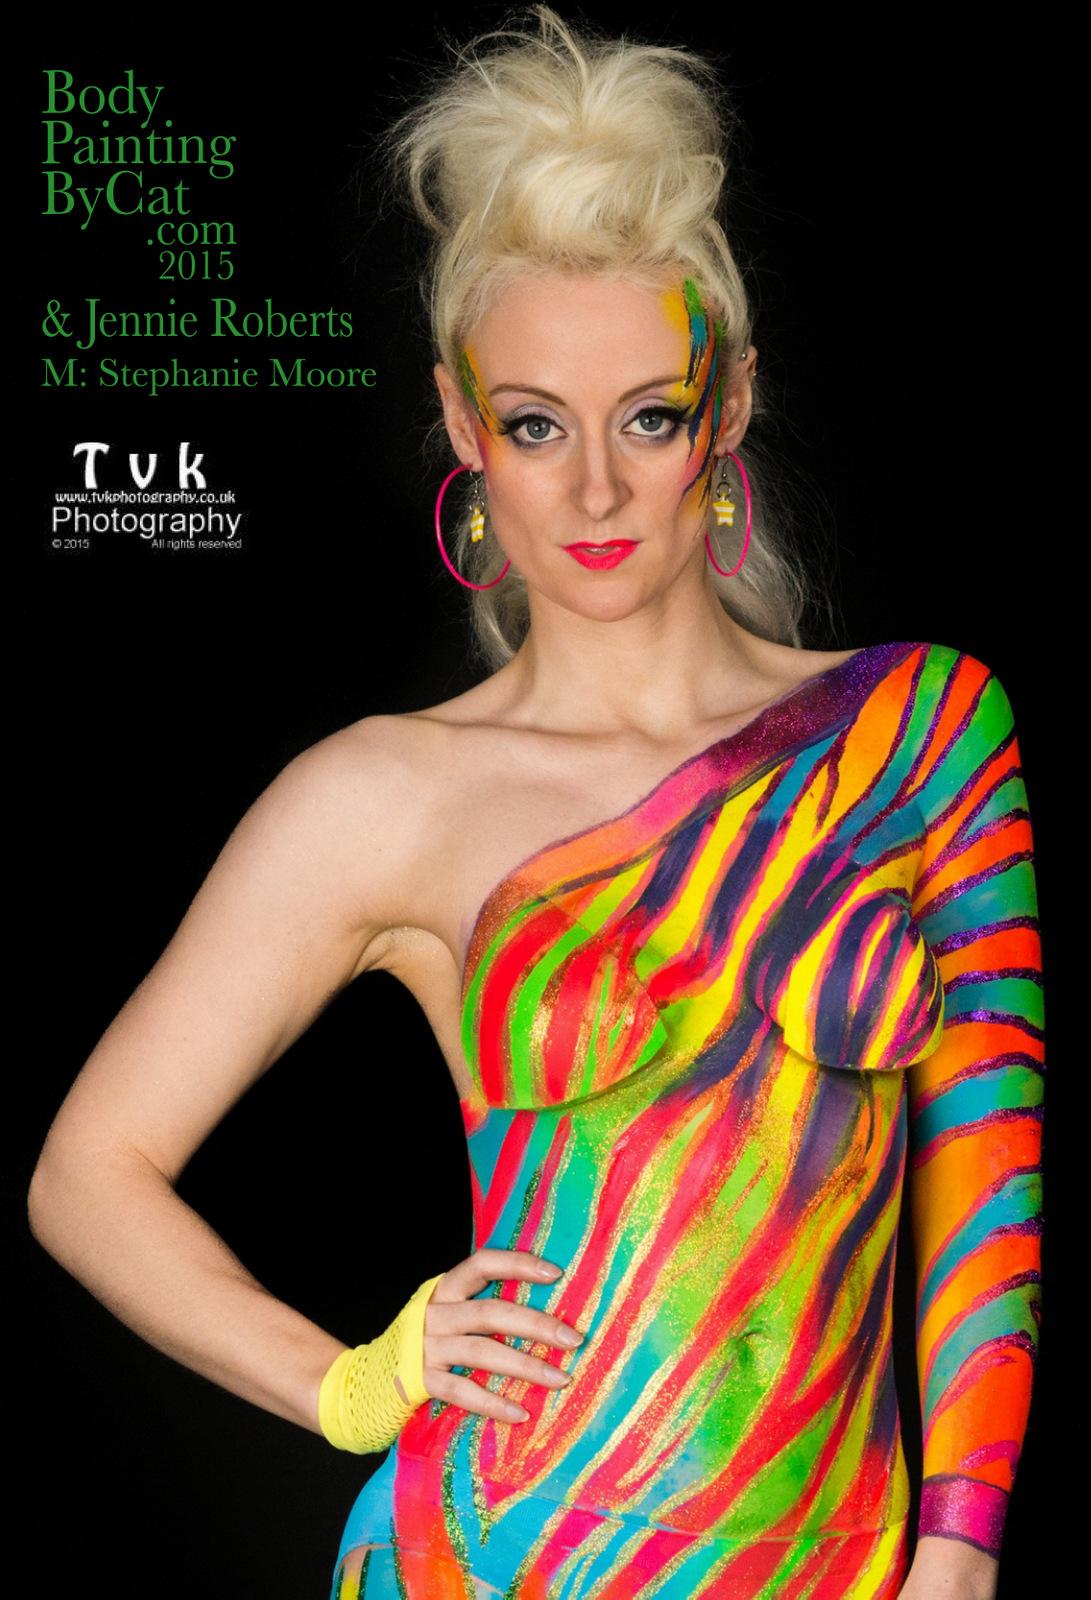 urban jungle neon zebra paintopia 2016 bodypaint body painting by cat. Black Bedroom Furniture Sets. Home Design Ideas